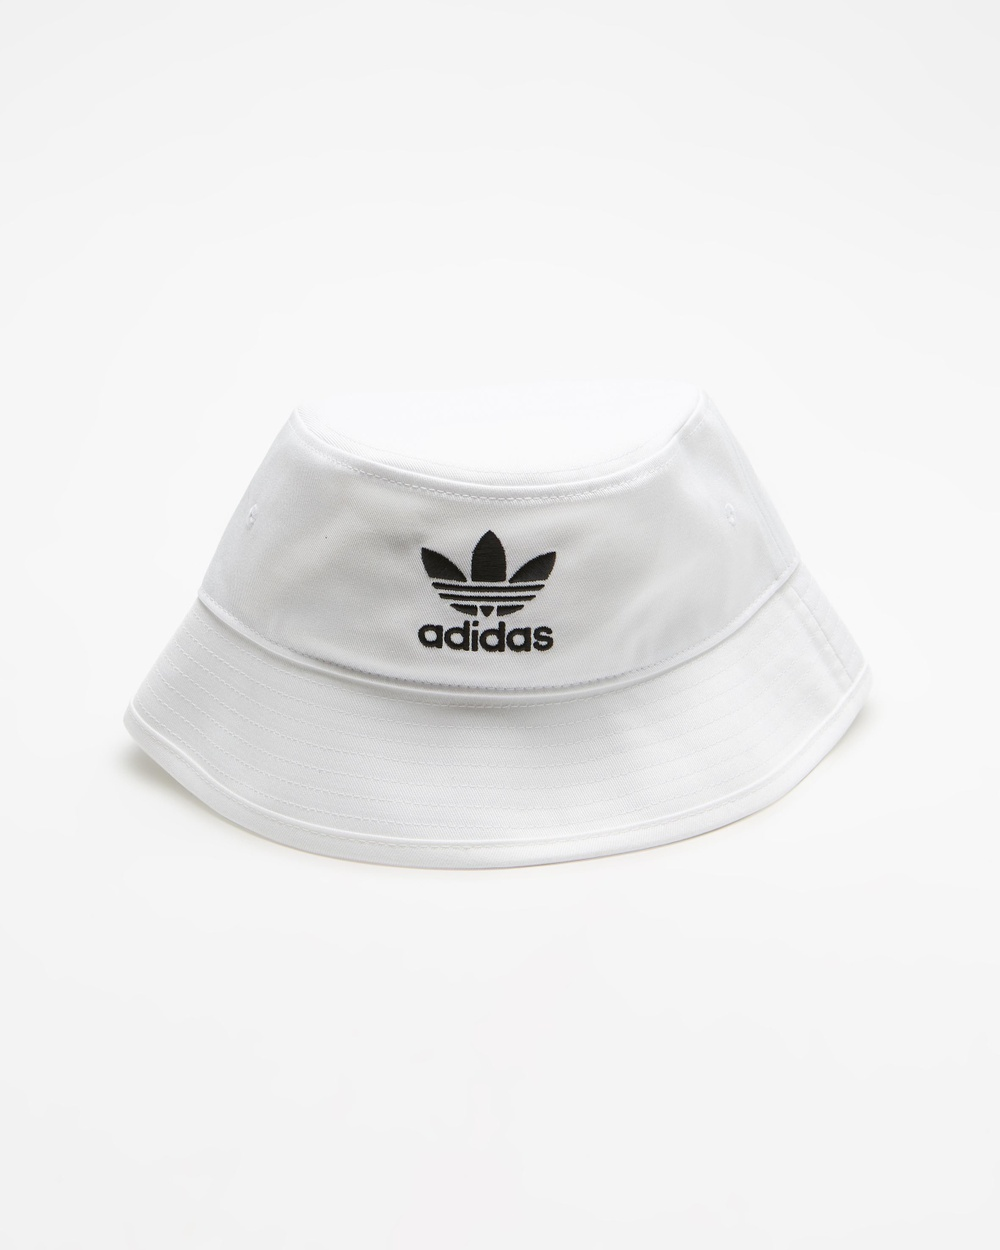 adidas Originals Adicolour Bucket Hat Hats White